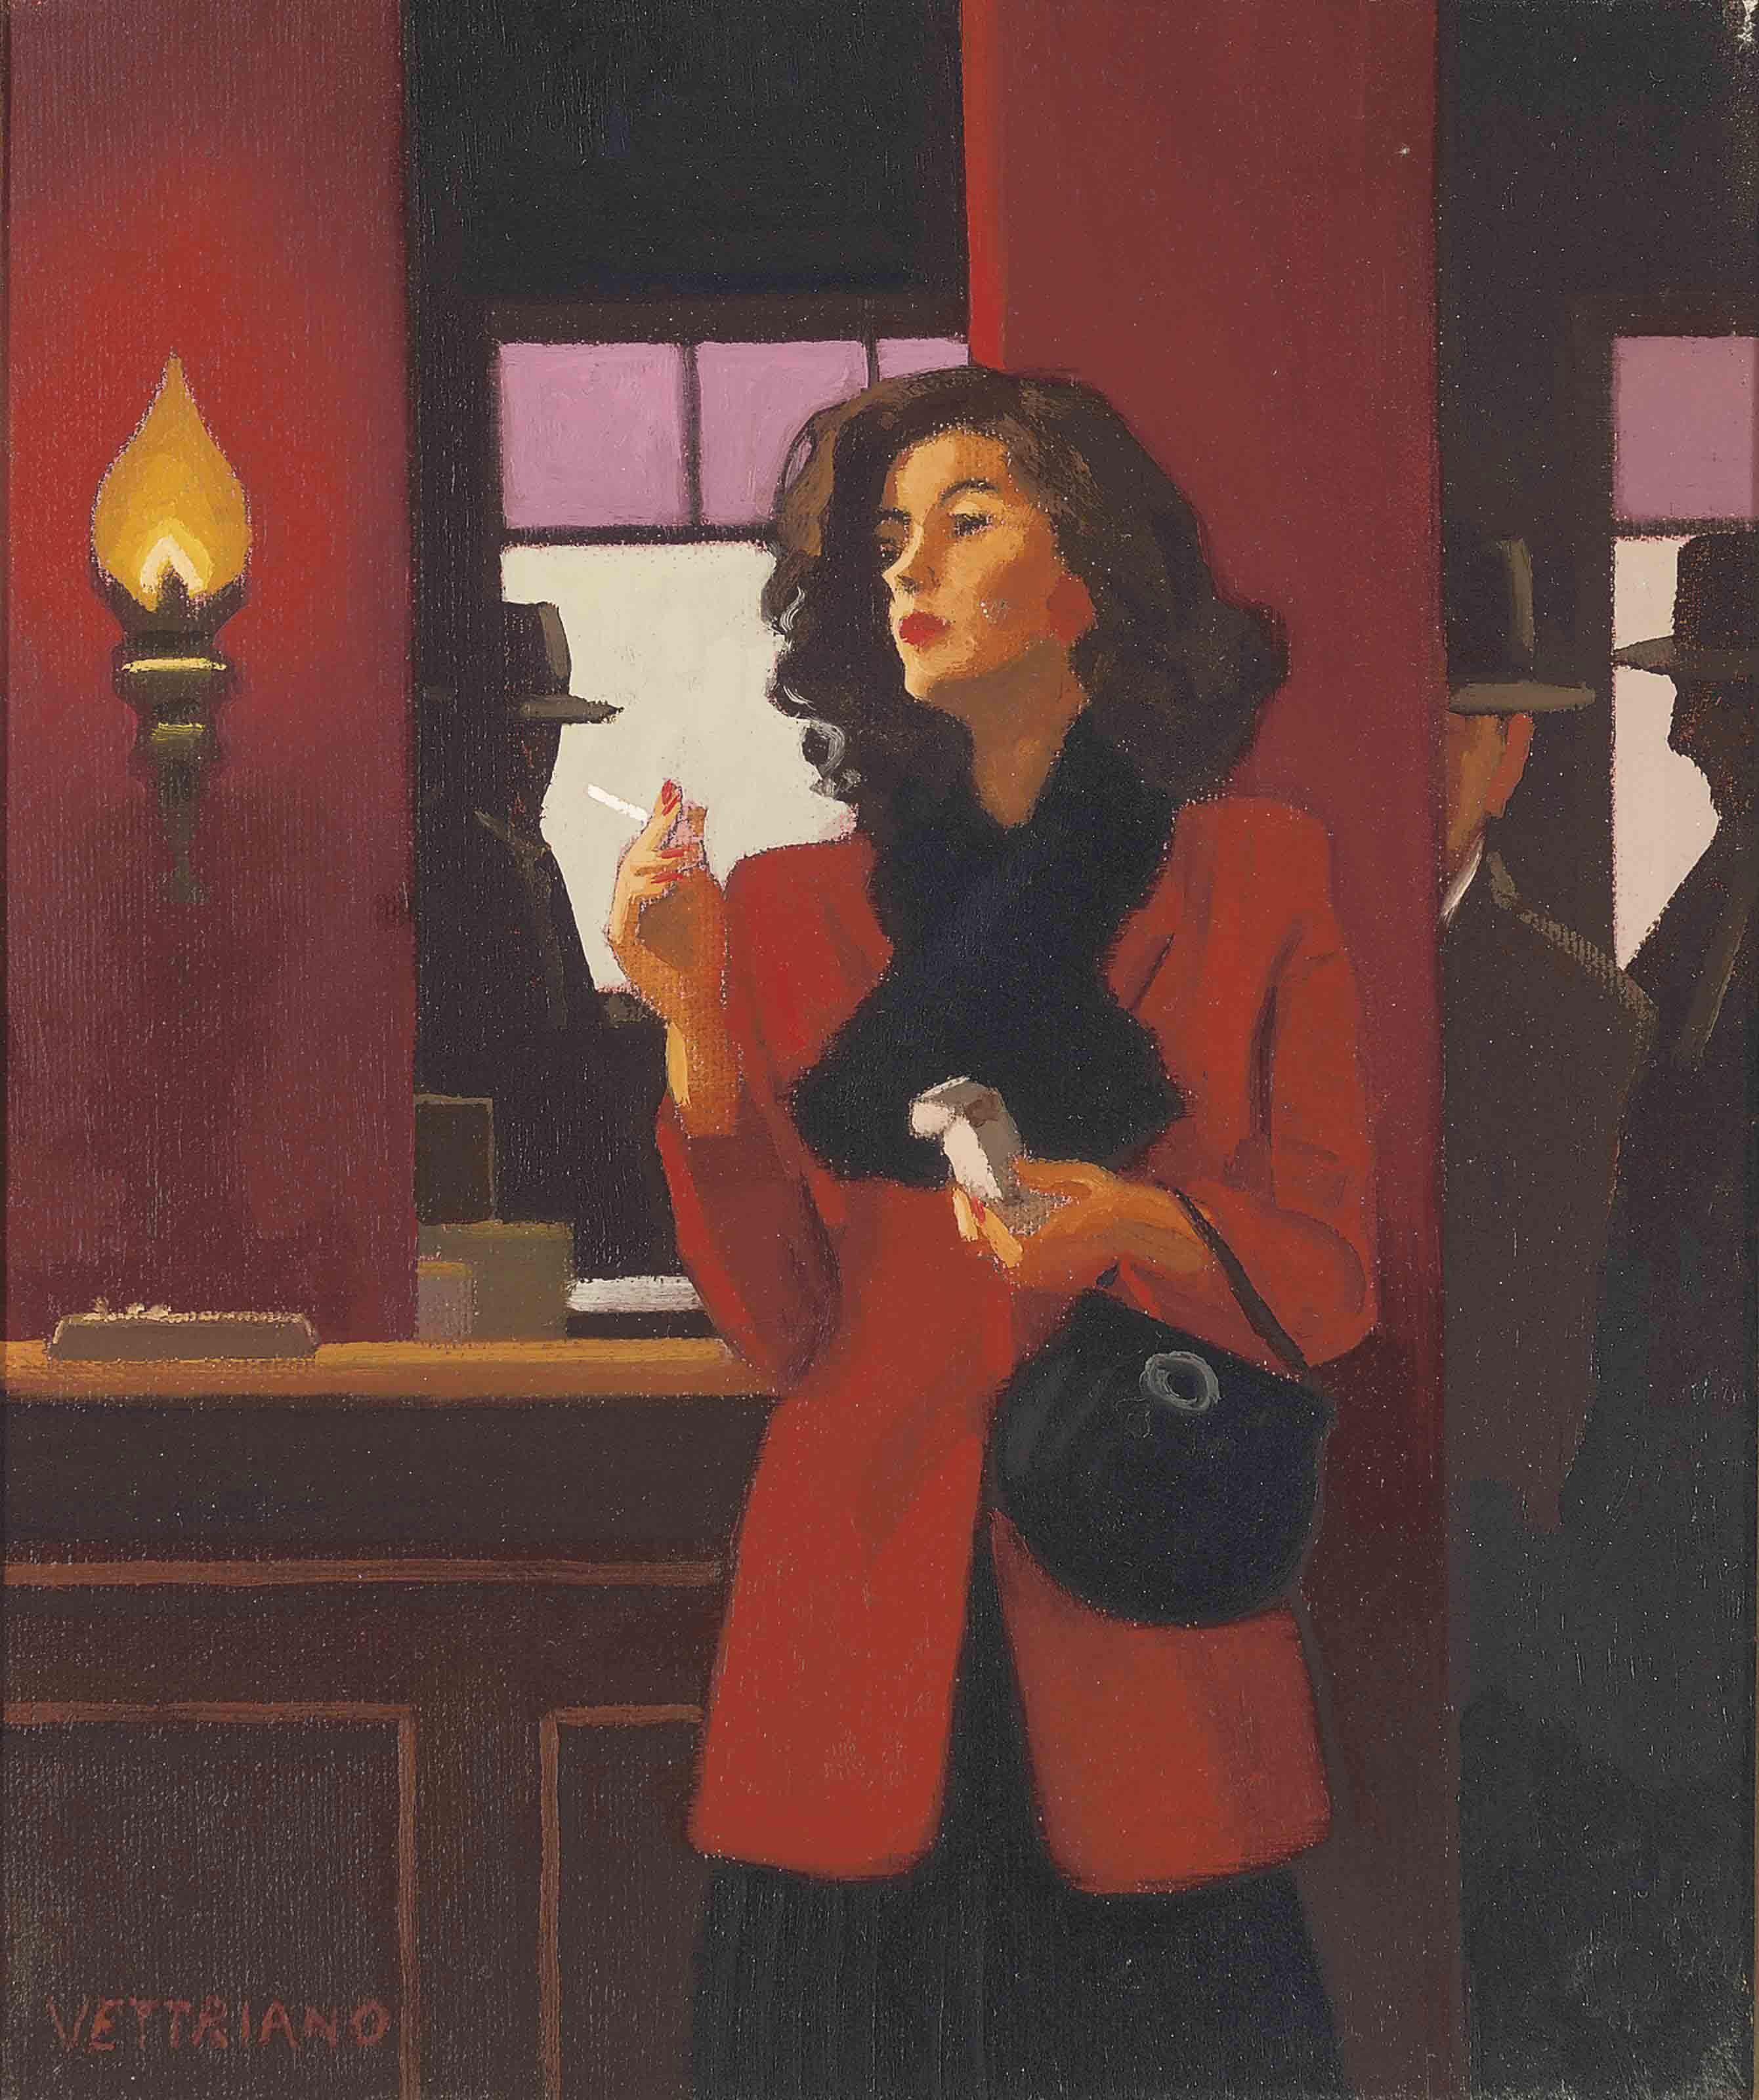 Jack Vettriano (b. 1951)